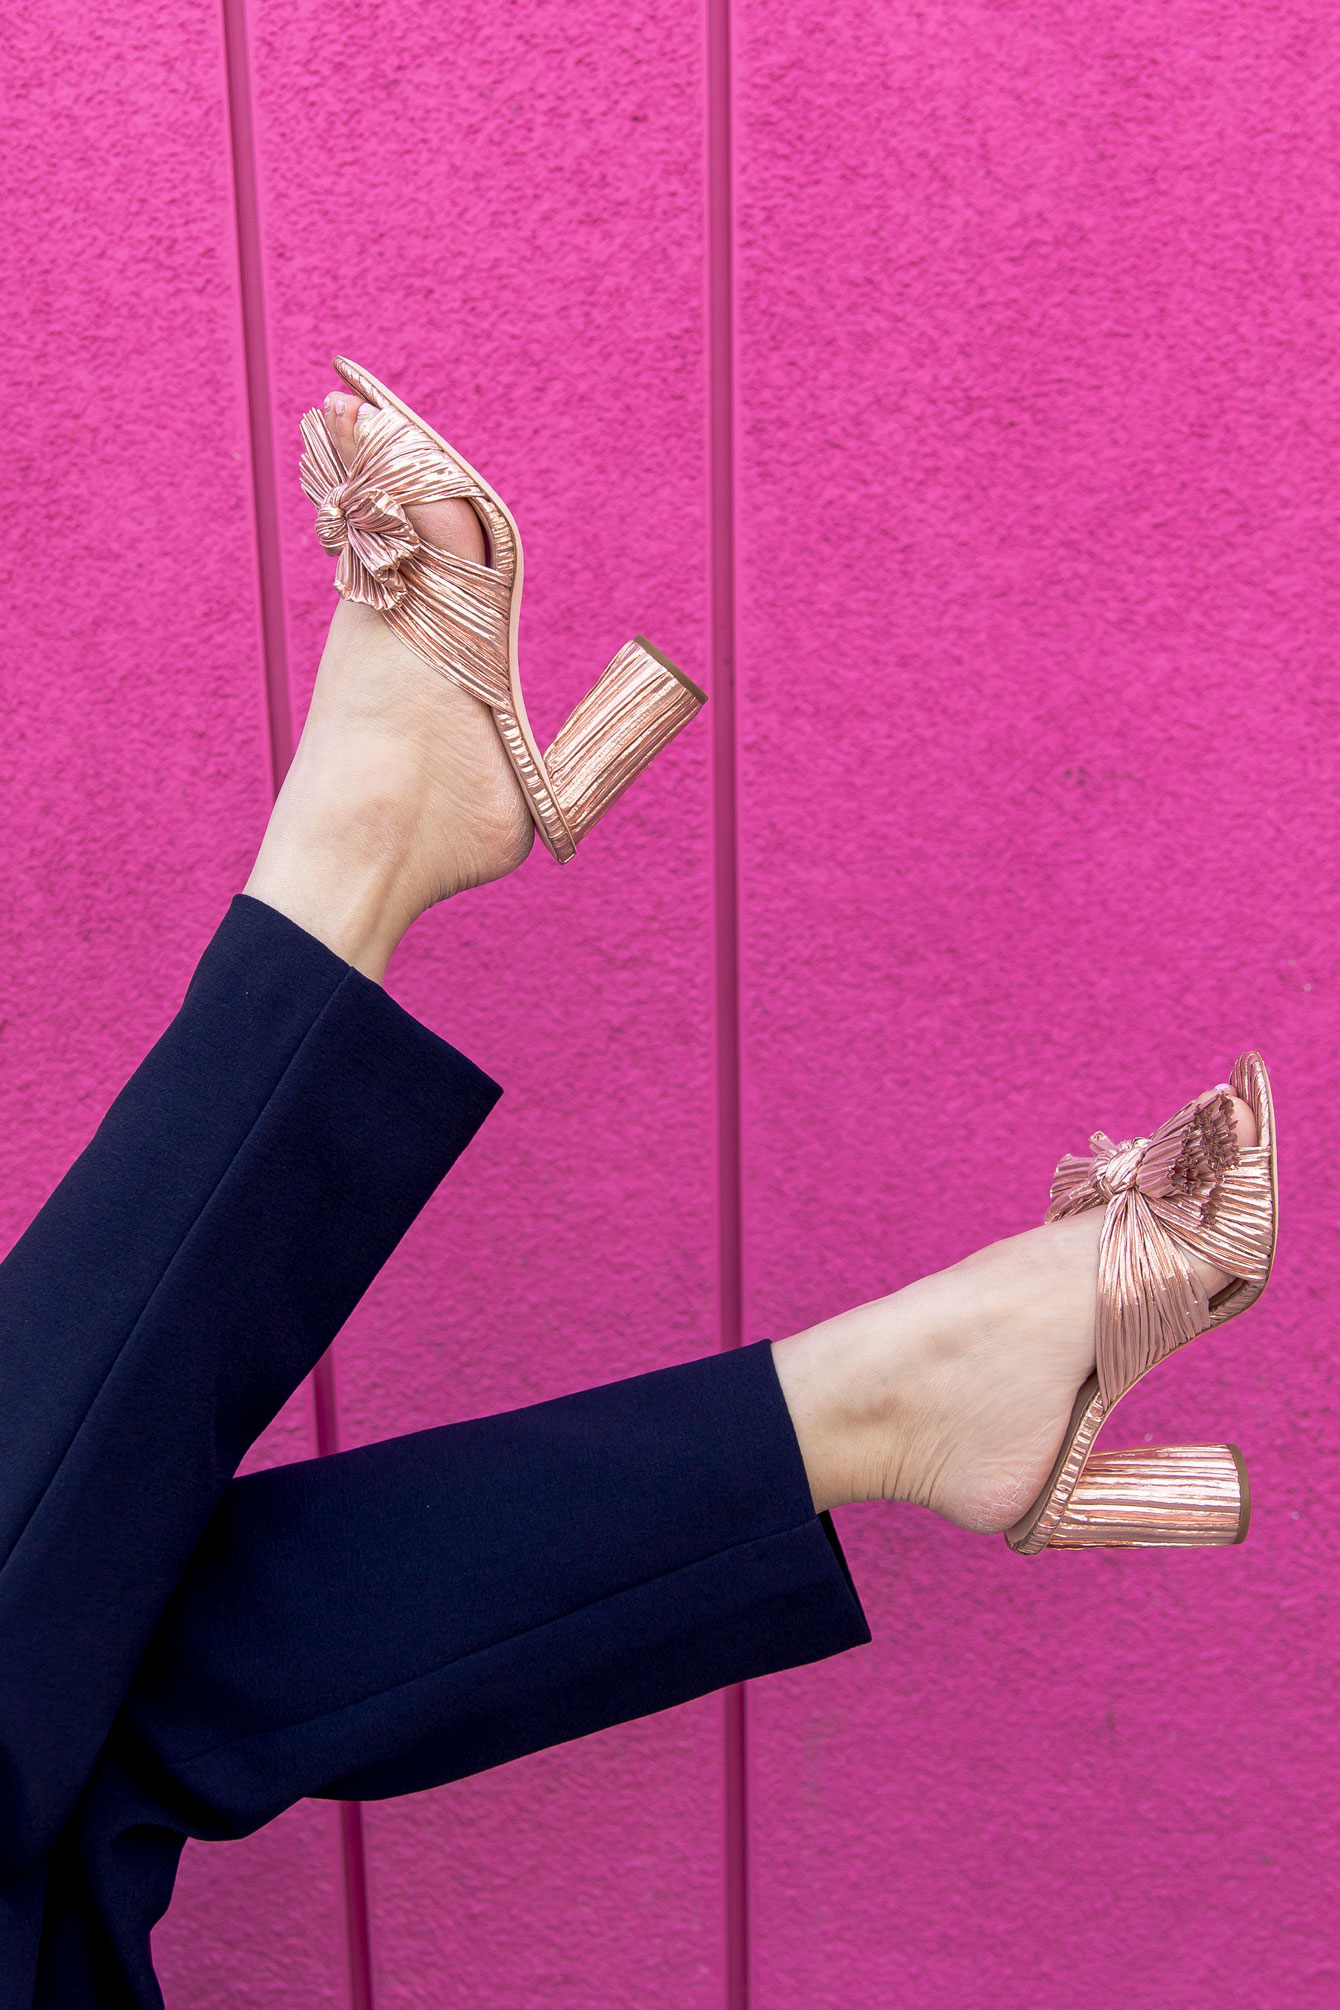 Loeffler Randall Penny Knot Sandals